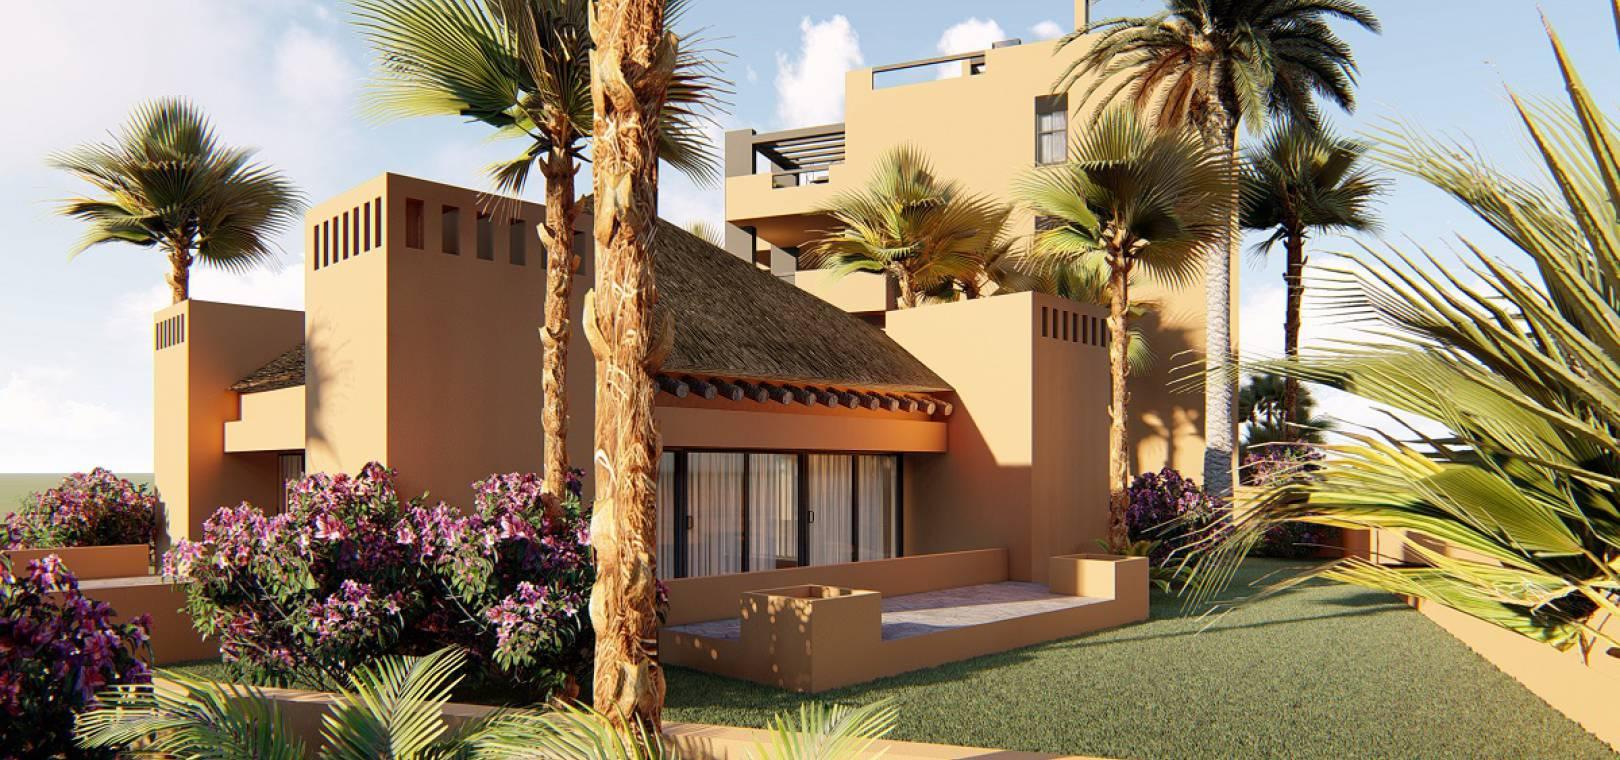 Palapa_Golf_Villamartin_New_Build_Properties_For_Sale_5